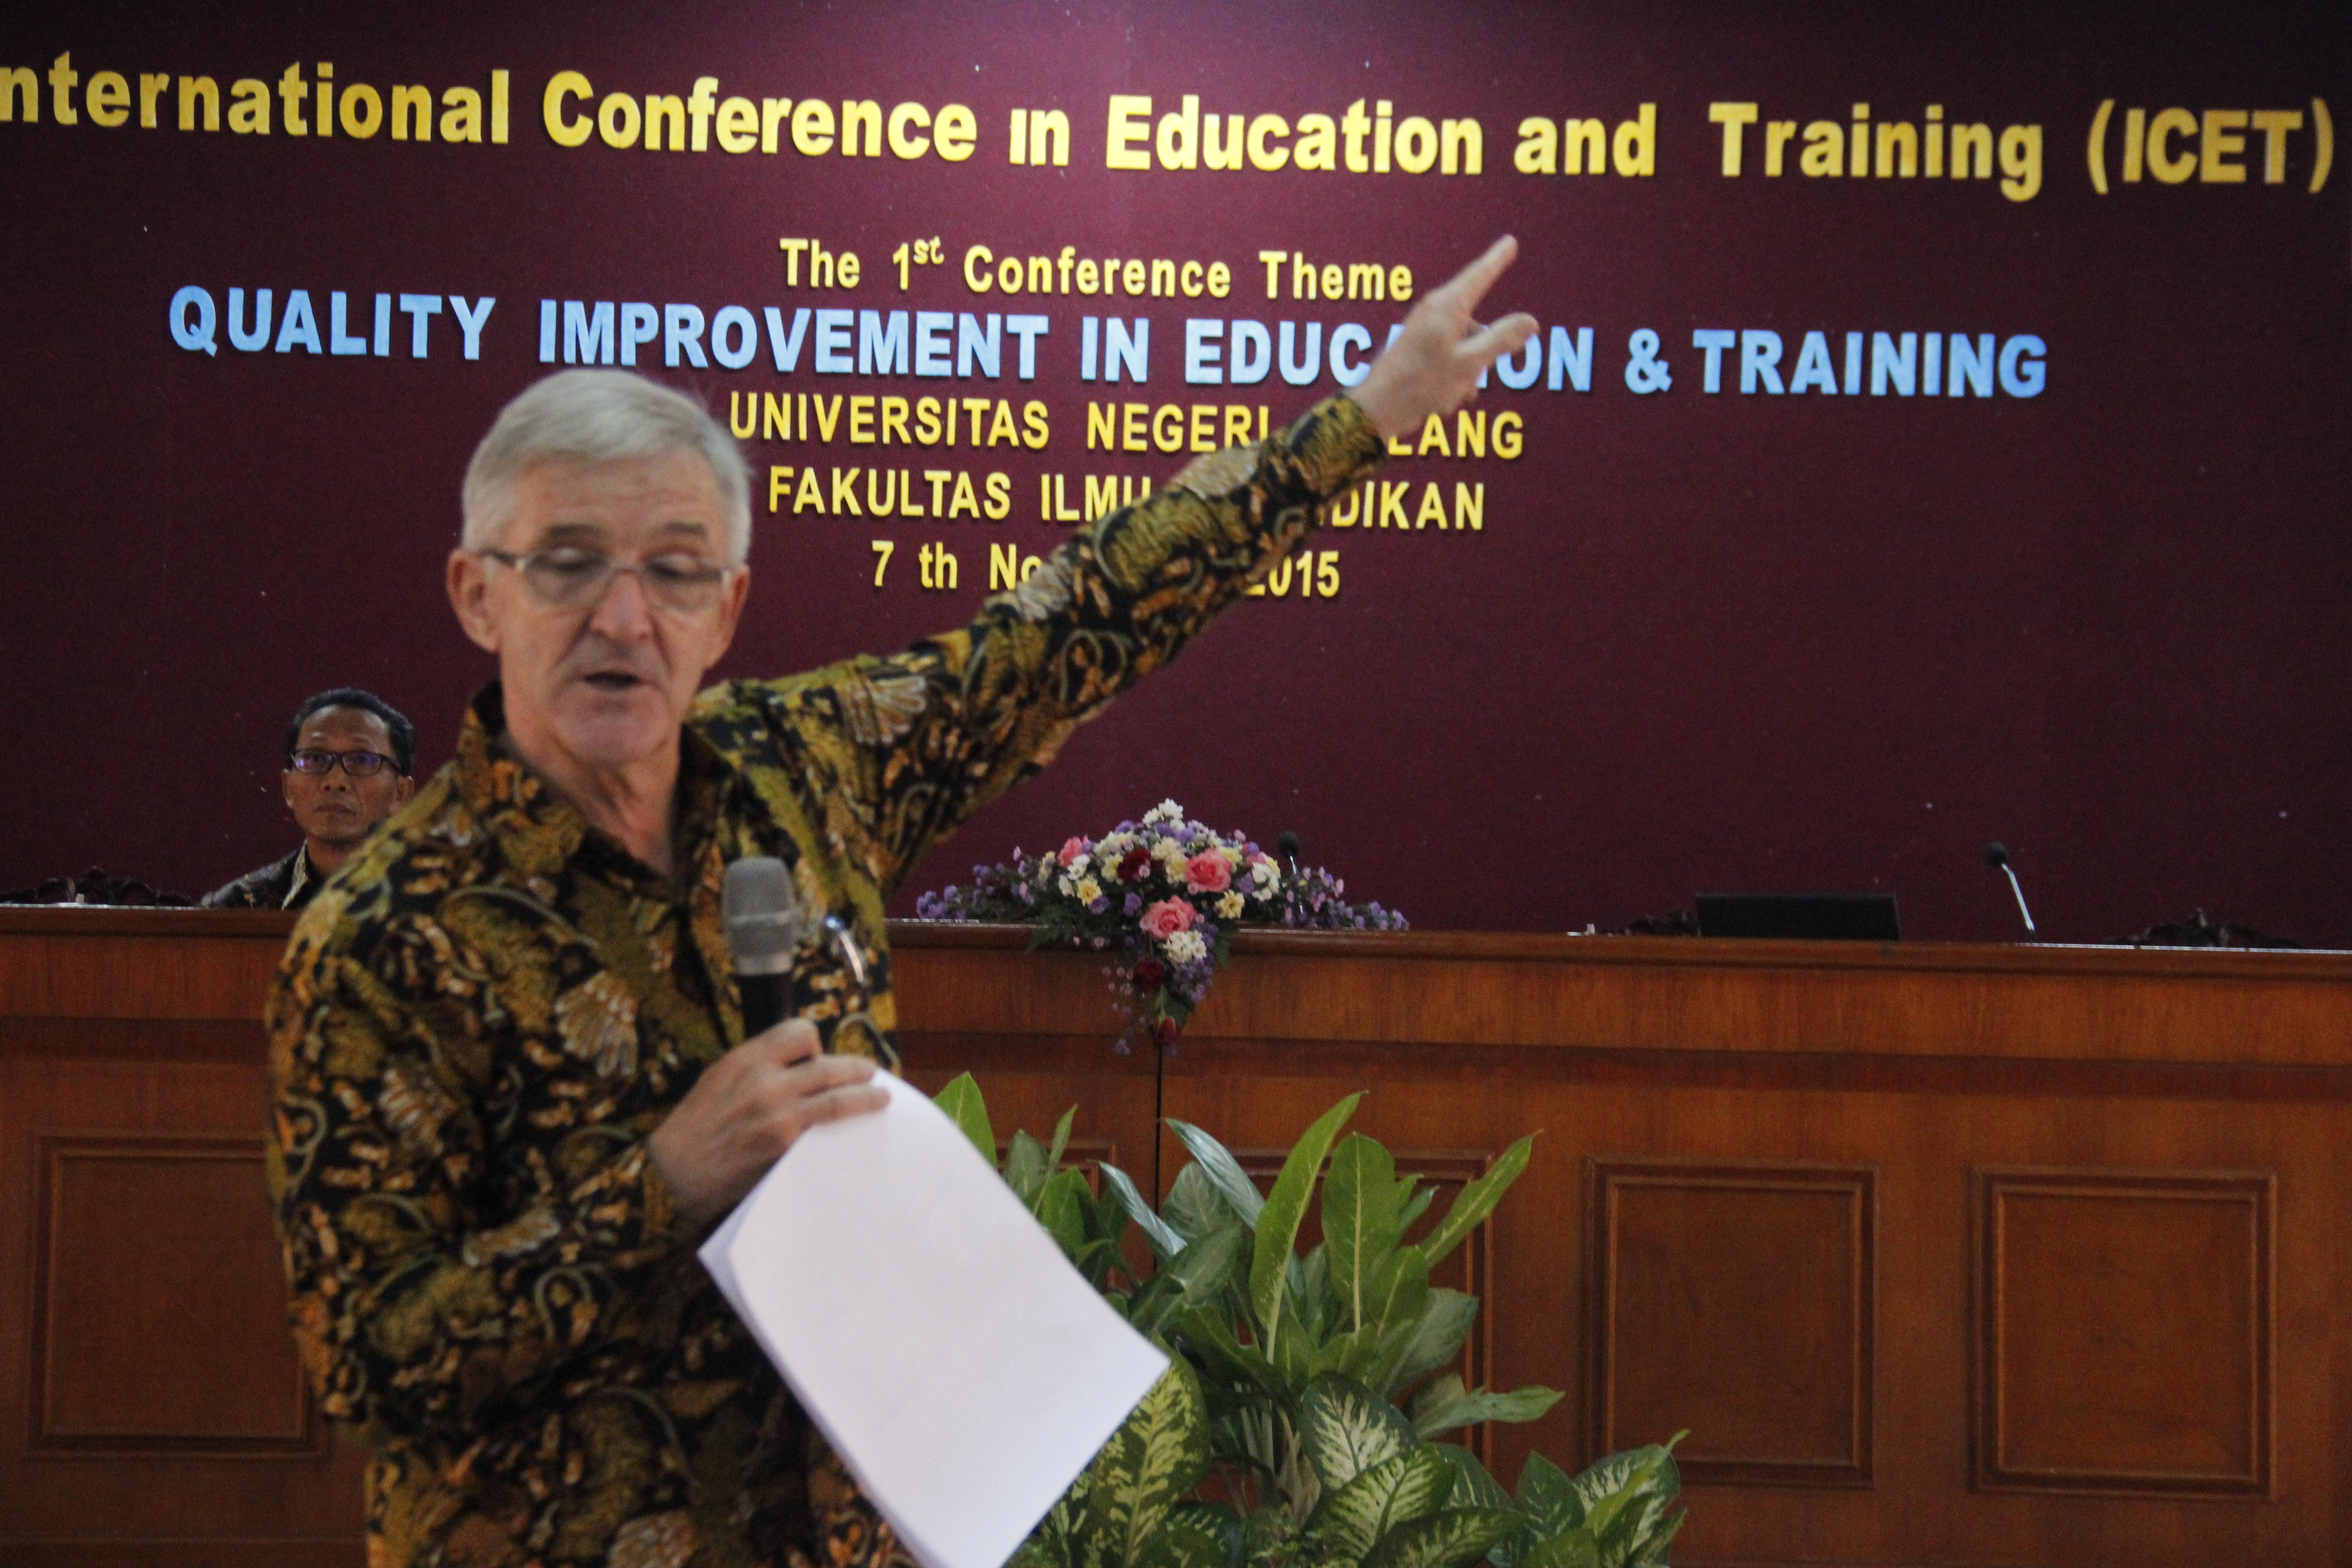 Mr. Sturt Weston, dari Inggris Direktur Program Prioritas, USAID. USA.